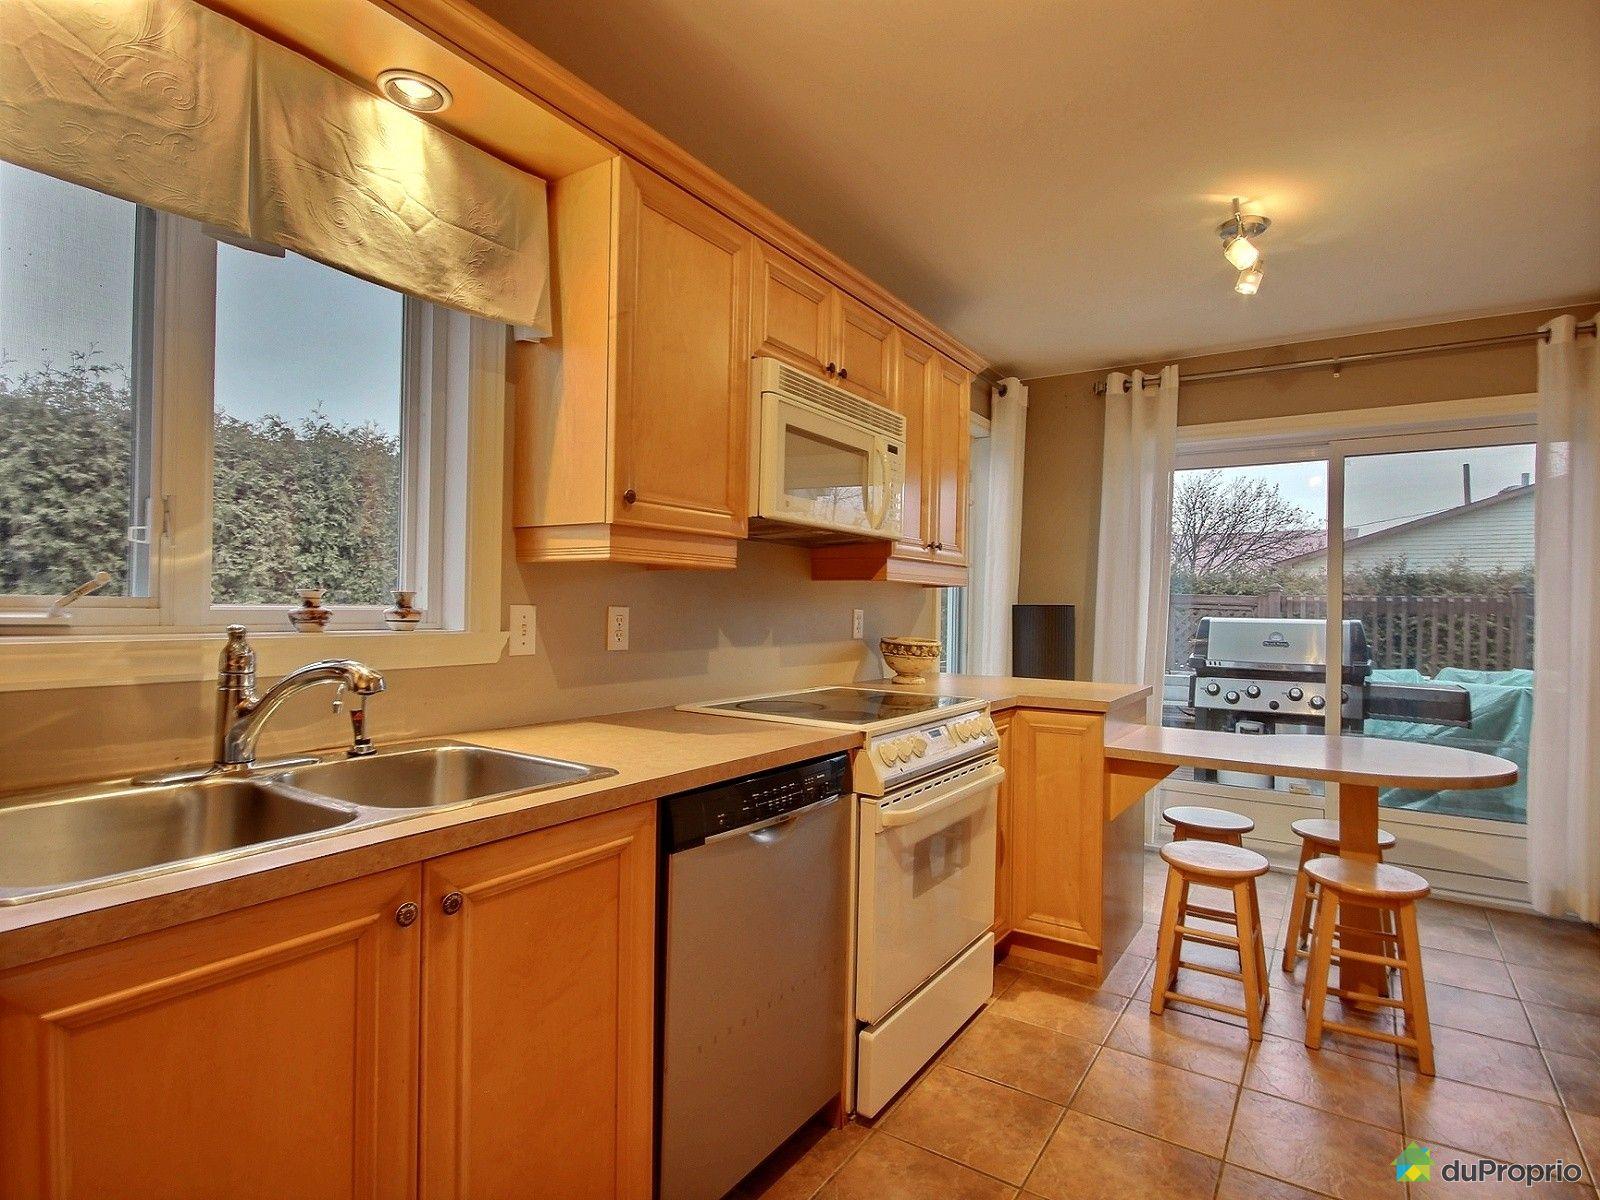 bi g n ration vendre richelieu 1458 4e rue immobilier qu bec duproprio 673704. Black Bedroom Furniture Sets. Home Design Ideas